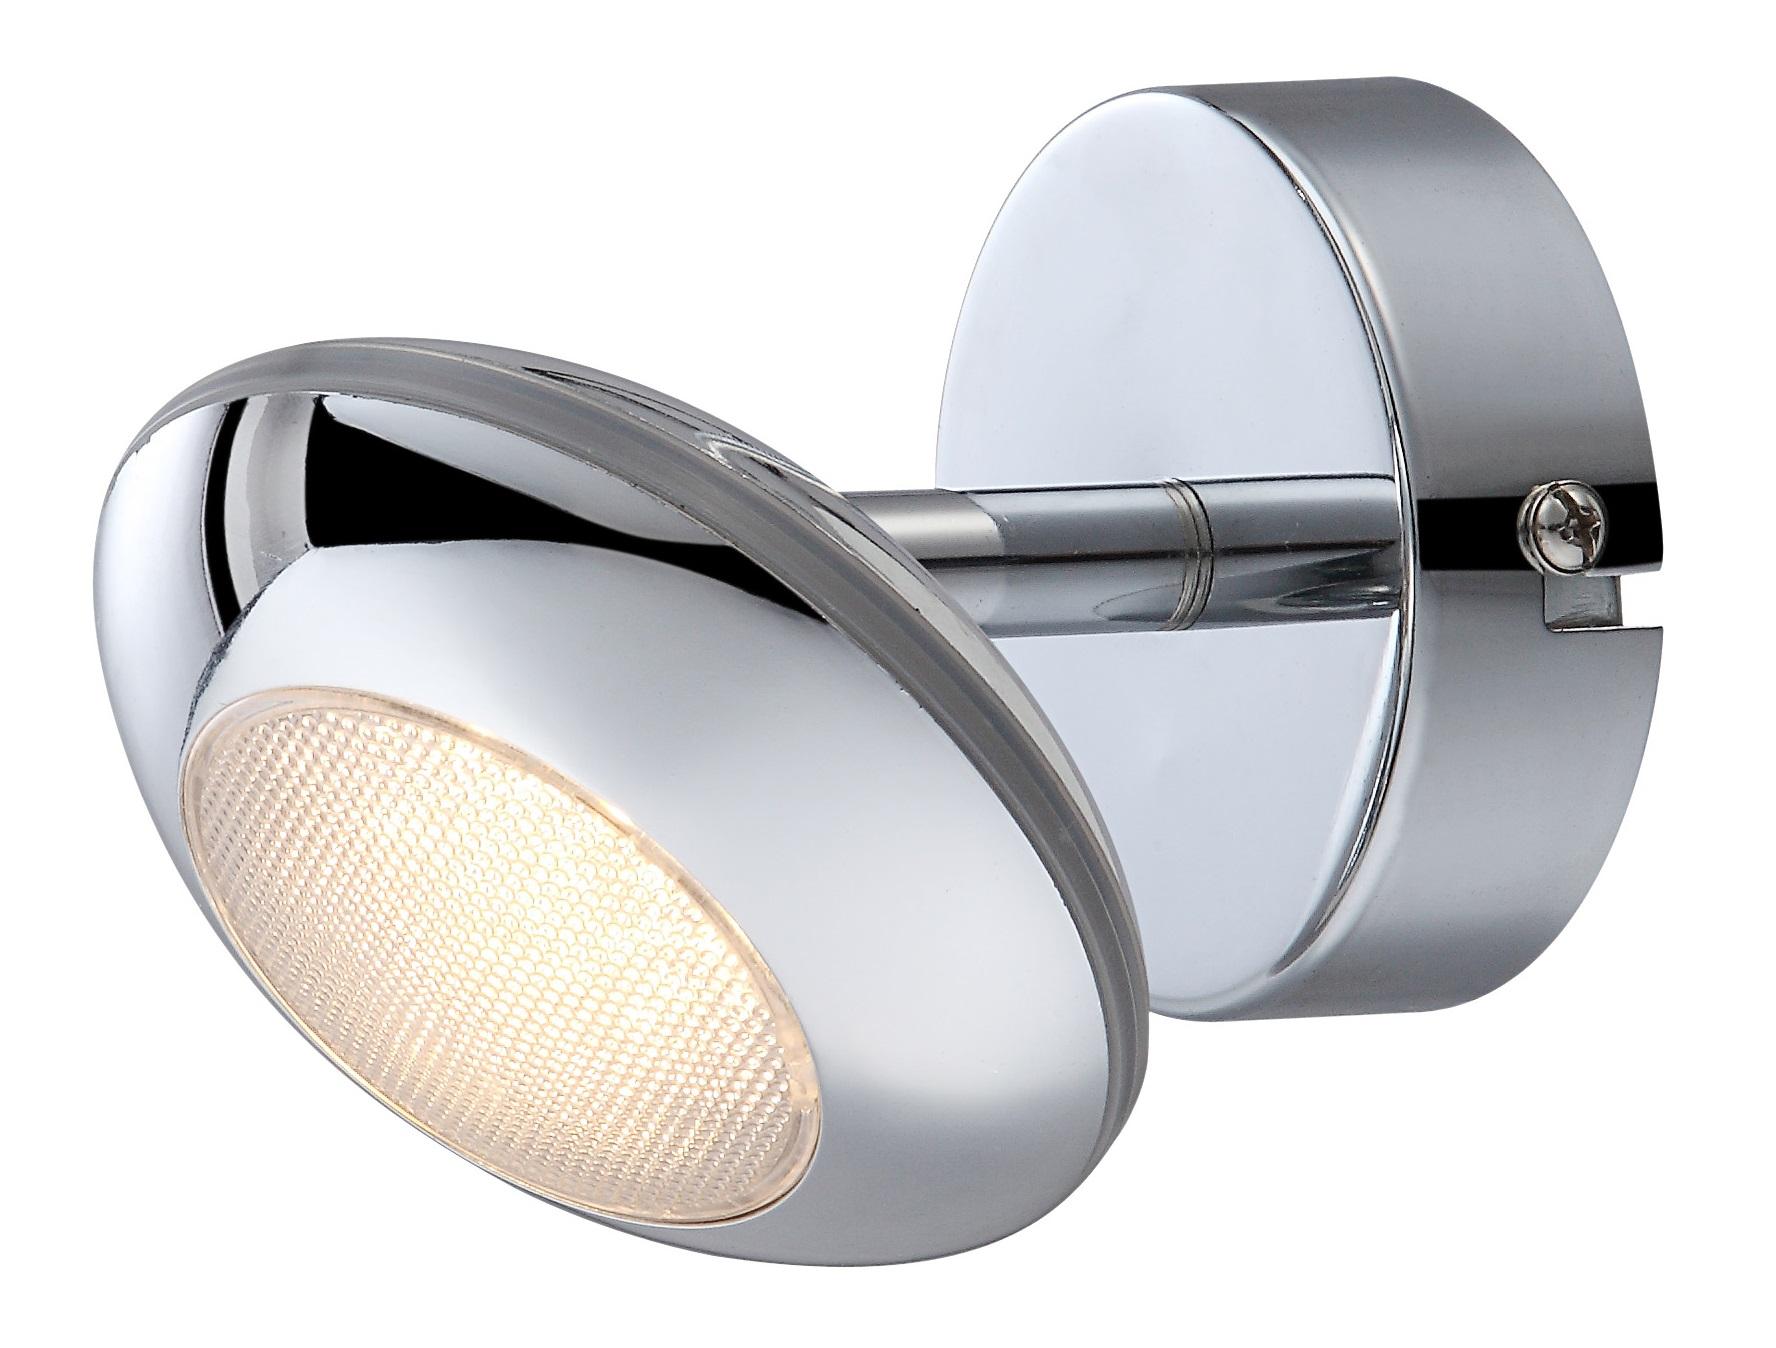 БраБра<br>Спот, арт. 56217-1, 1x5W, LED, хром Вид цоколя: LED Количество ламп: 1 Наличие ламп: в комплекте&amp;lt;div&amp;gt;&amp;lt;div&amp;gt;Вид цоколя: LED&amp;lt;/div&amp;gt;&amp;lt;div&amp;gt;Мощность: &amp;amp;nbsp;5W&amp;amp;nbsp;&amp;lt;/div&amp;gt;&amp;lt;div&amp;gt;Количество ламп: 1 (в комплекте)&amp;lt;/div&amp;gt;&amp;lt;/div&amp;gt;<br><br>Material: Металл<br>Length см: None<br>Width см: None<br>Depth см: 11,5<br>Height см: None<br>Diameter см: 10